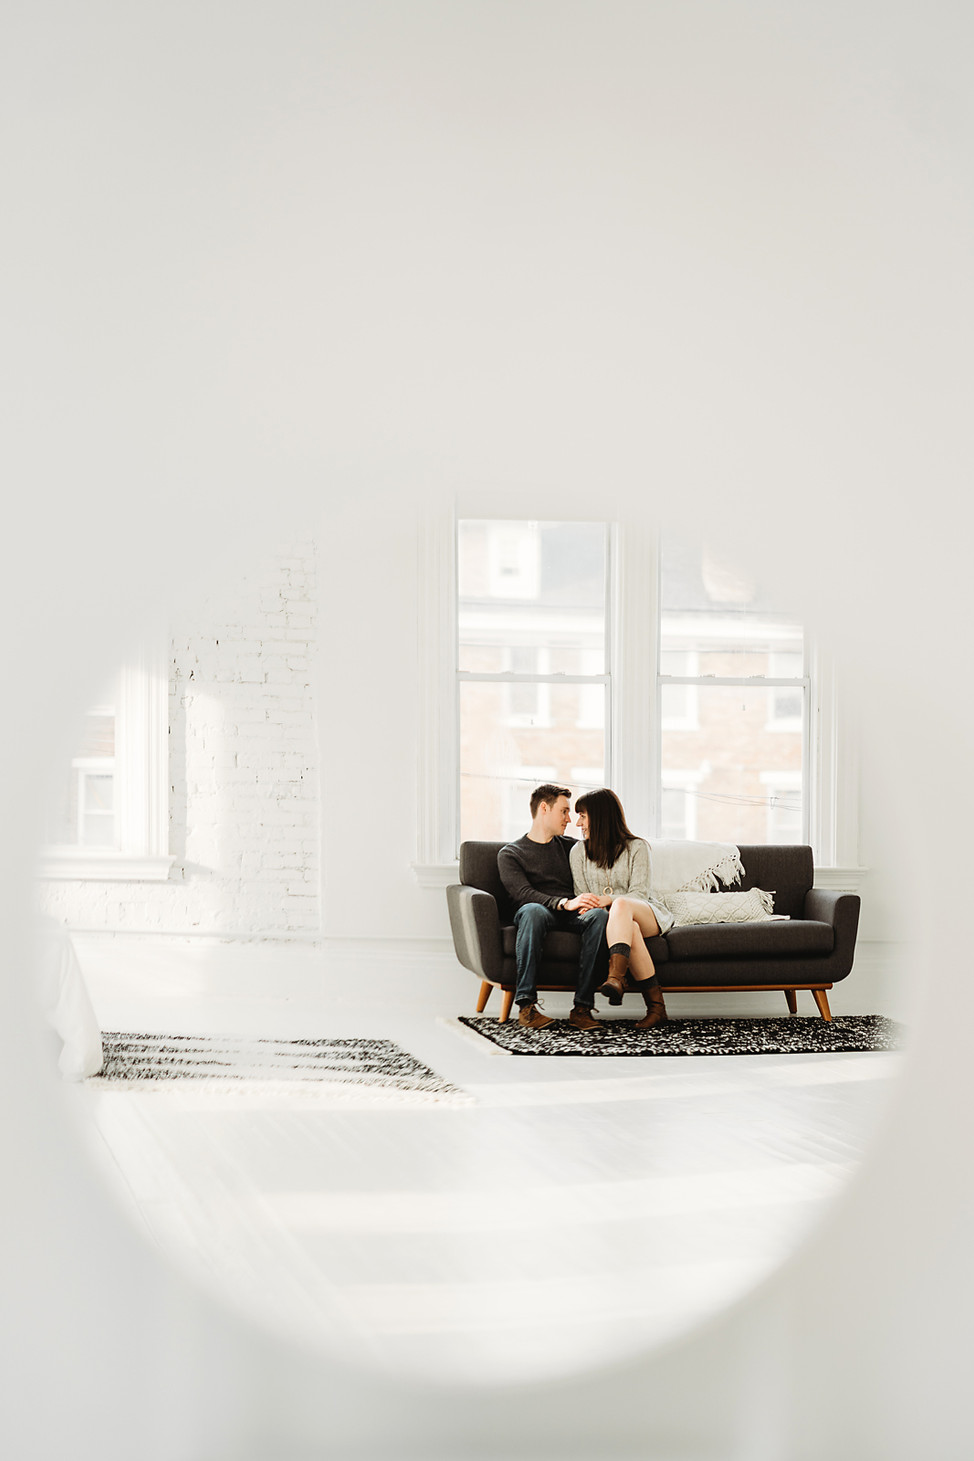 Jake + Jenny, Engagement session || Locust and Vine, Cincinnati, OH